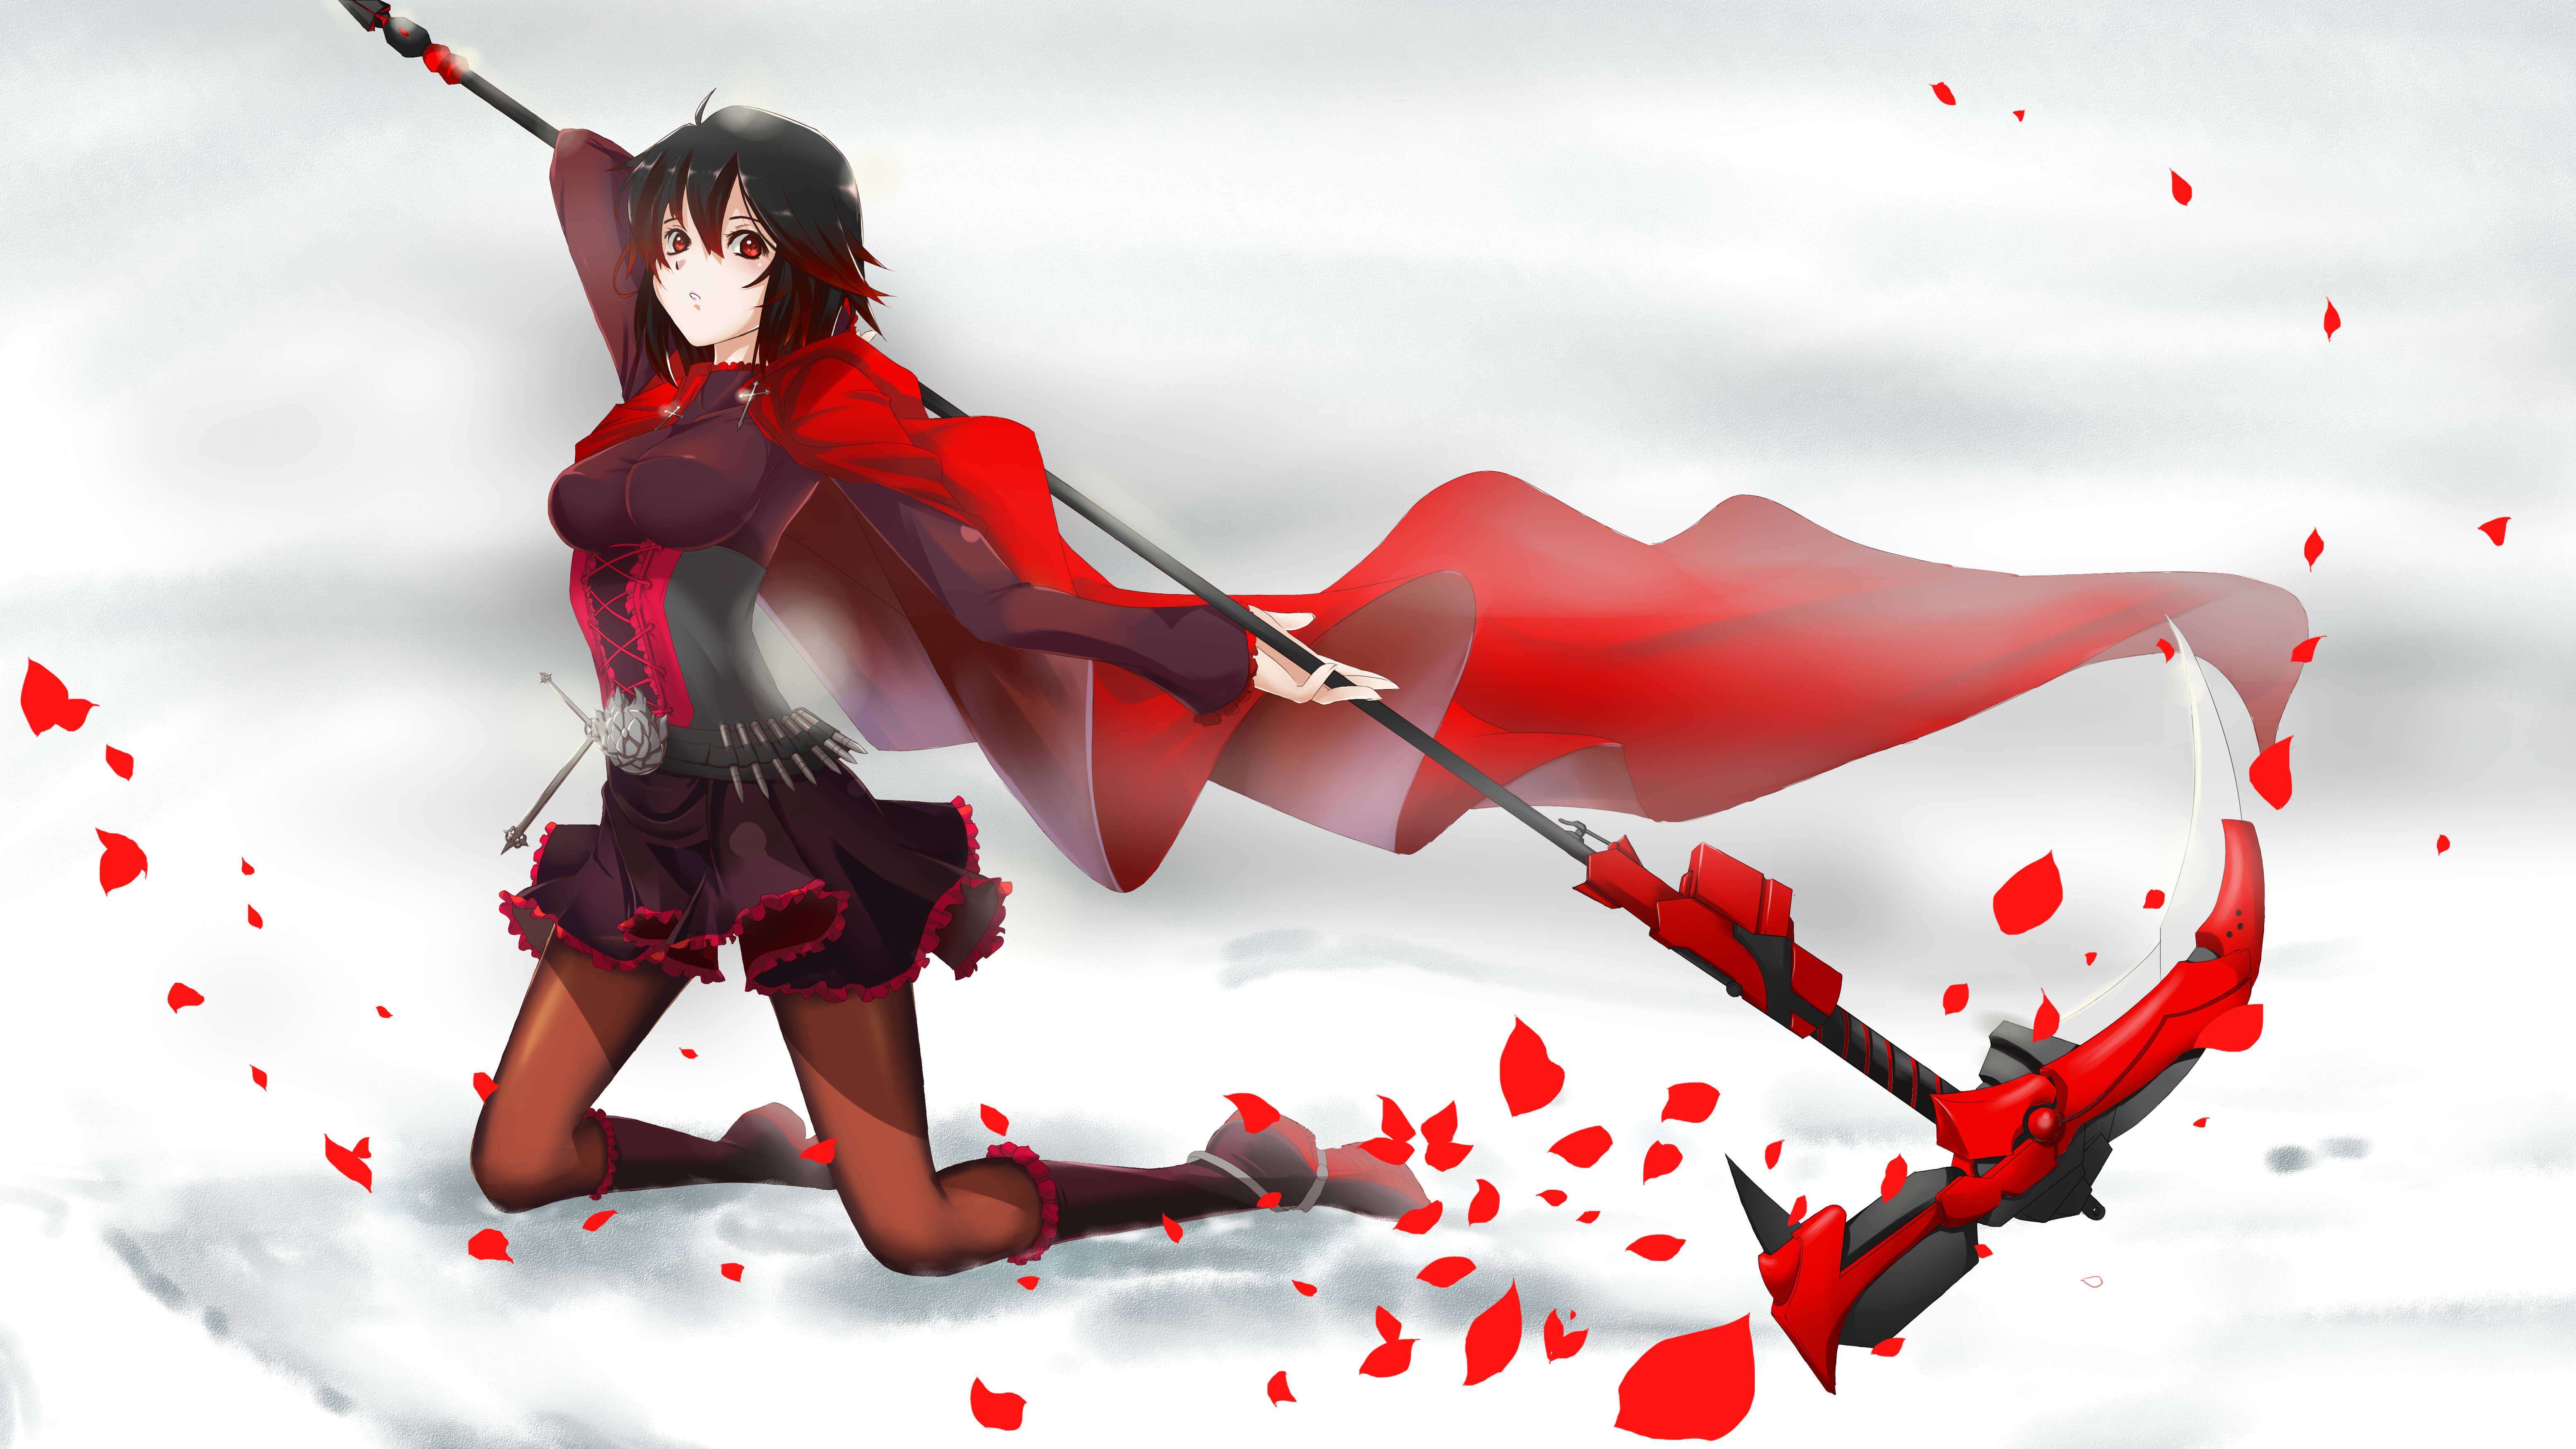 Ruby rose rwby drawn by sushu danbooru - Ruby rose rule 34 ...